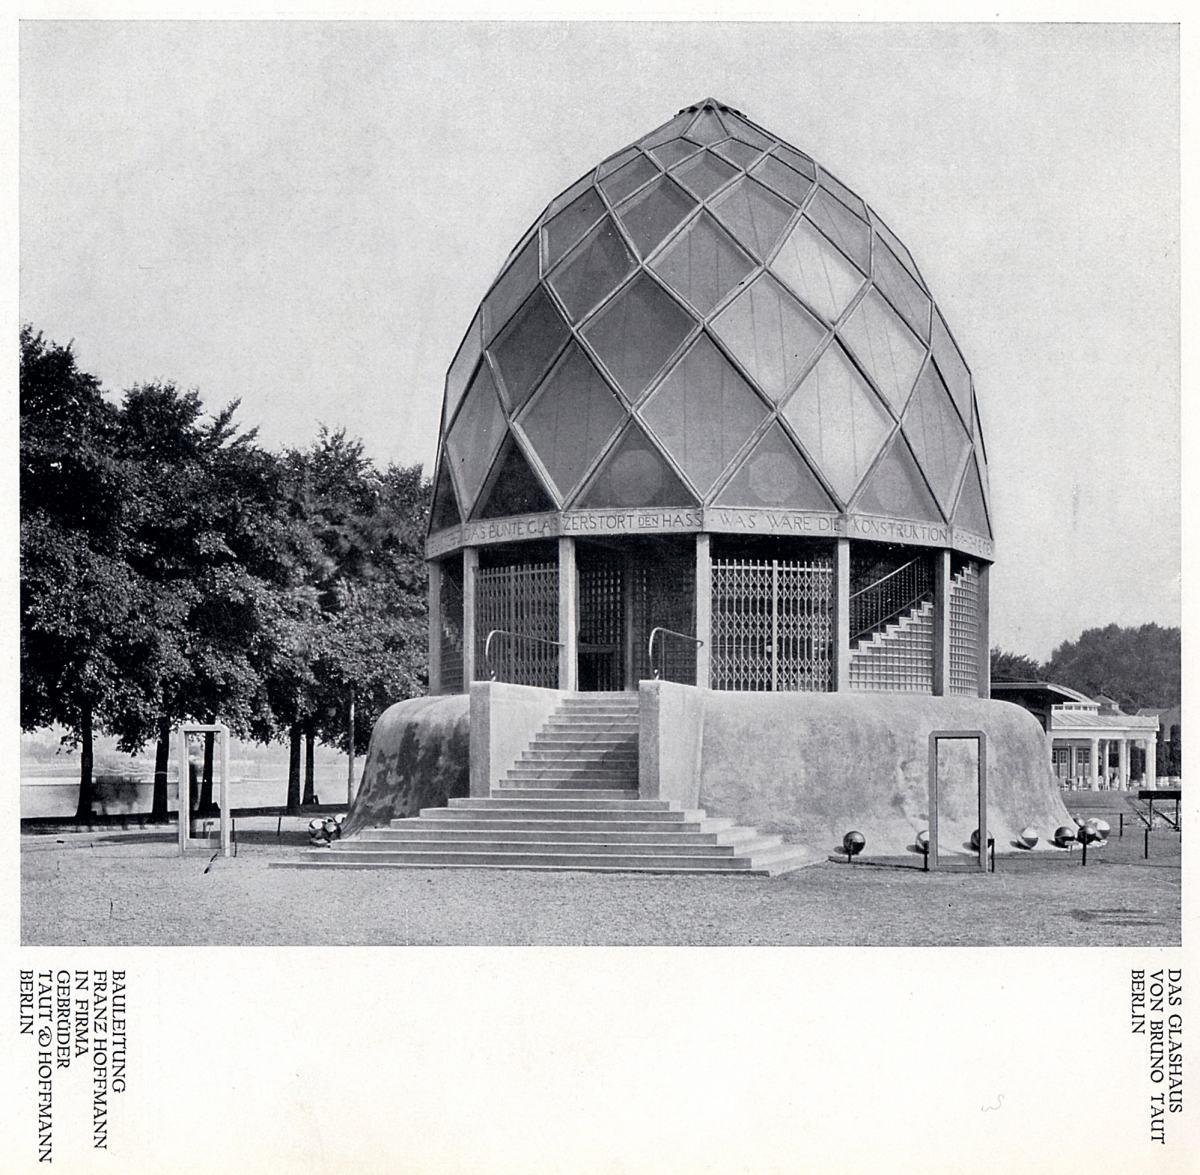 Taut Glashaus